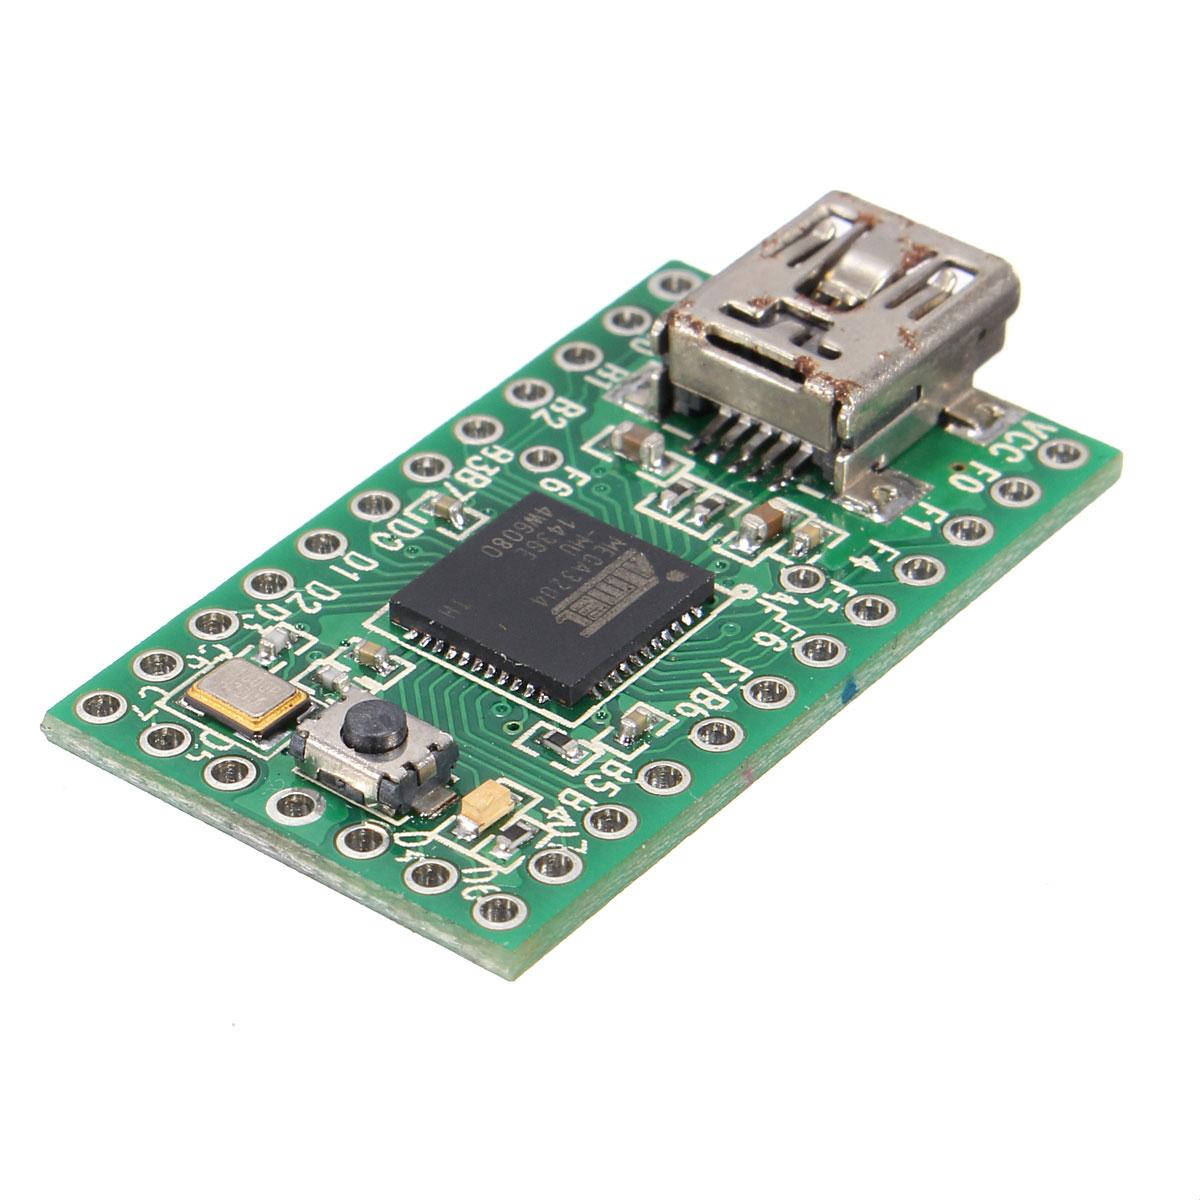 Teensy usb keyboard mouse avr arduino isp board